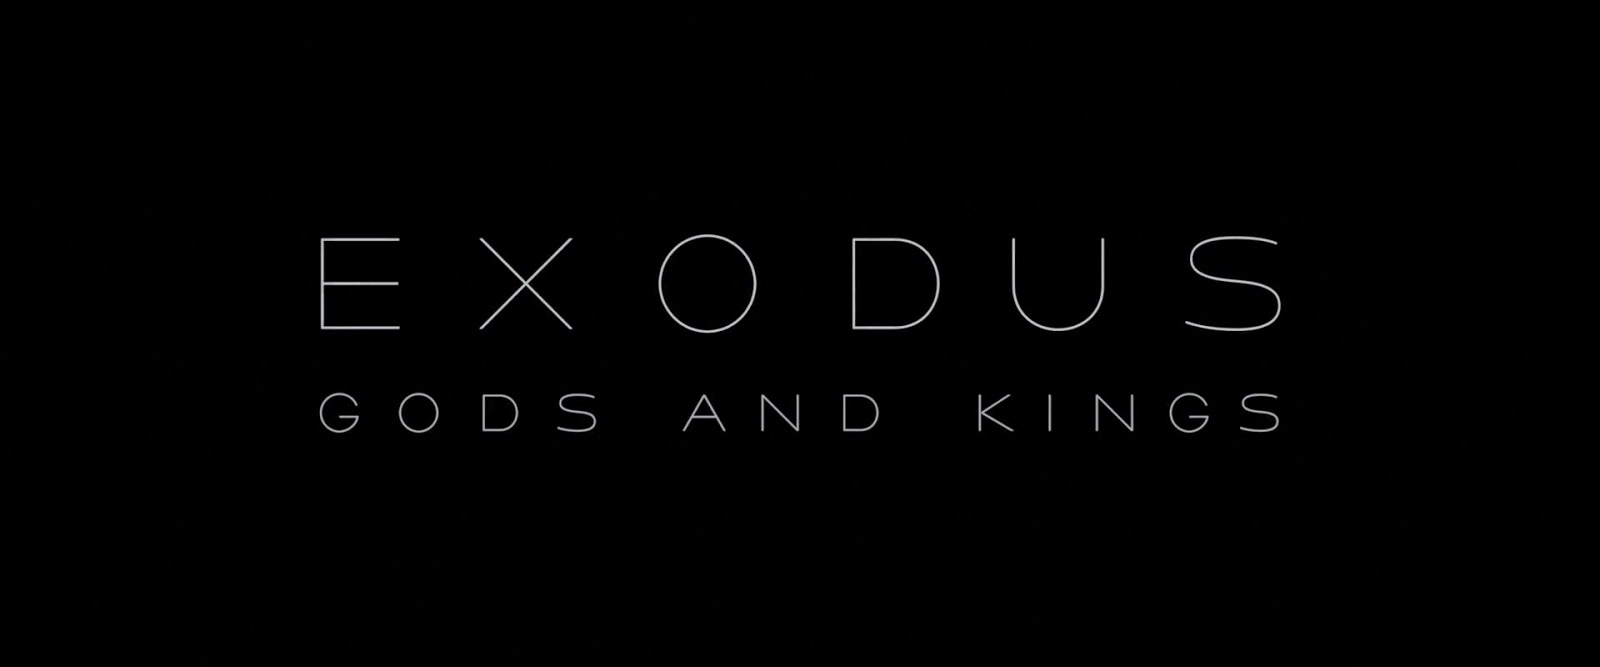 Exodus: Gods and Kings (2014) S2 s Exodus: Gods and Kings (2014)